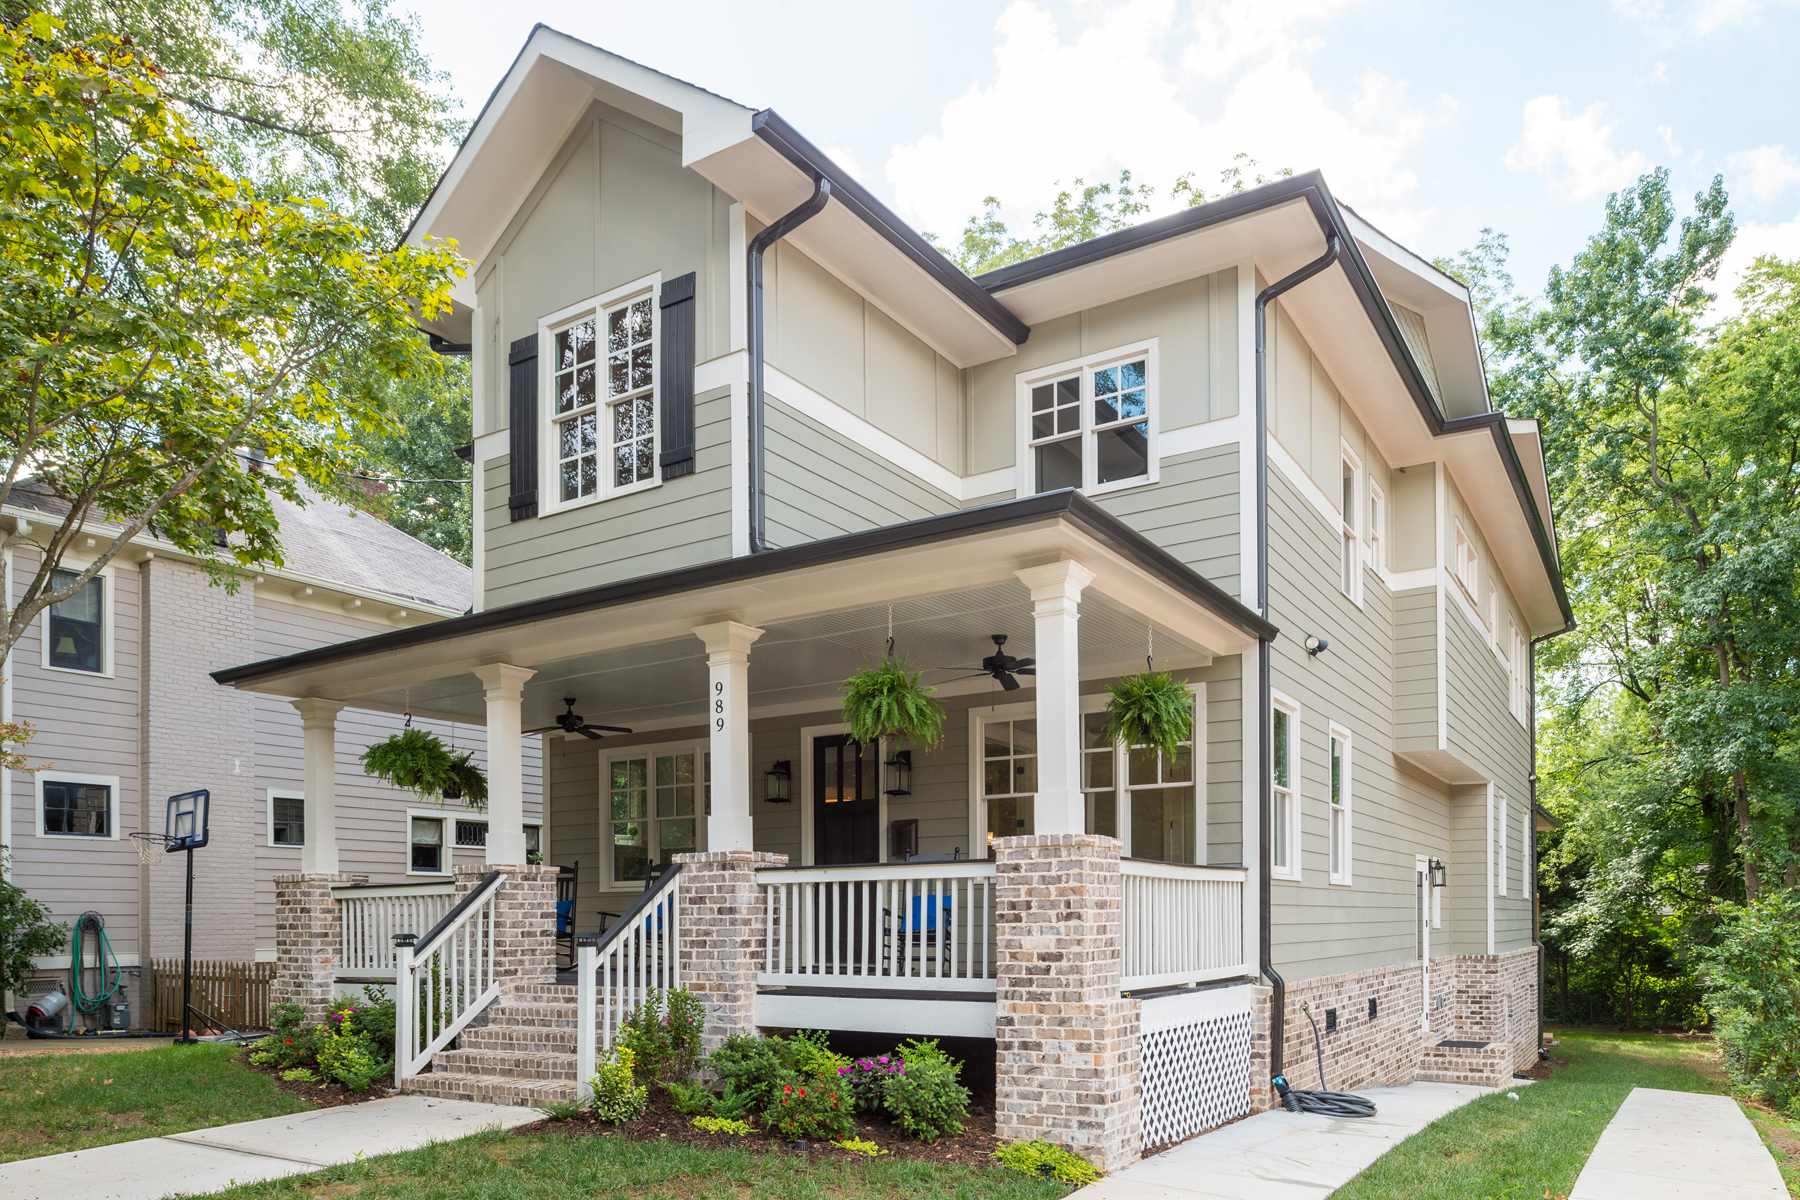 Single Family Home for Sale at Fabulous New Construction Blocks From Virginia Highland Village 989 Drewry Street NE Virginia Highland, Atlanta, Georgia, 30306 United States